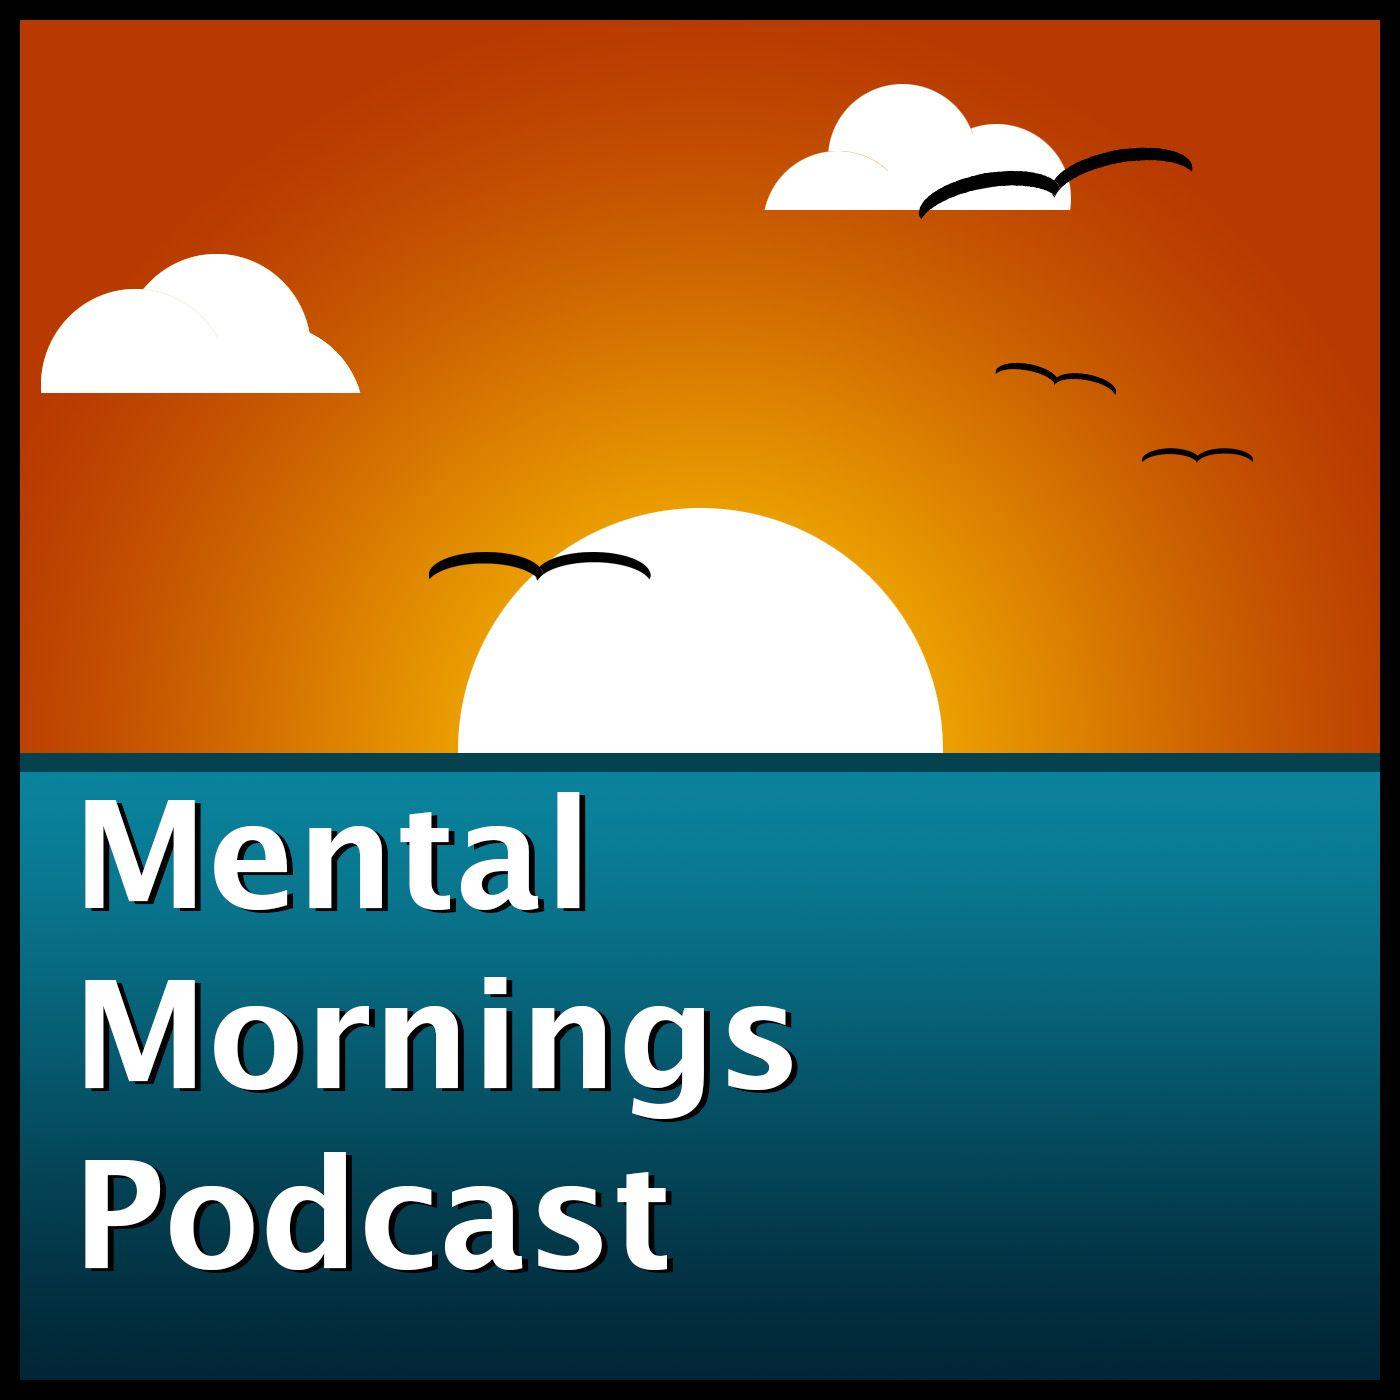 Mental Mornings